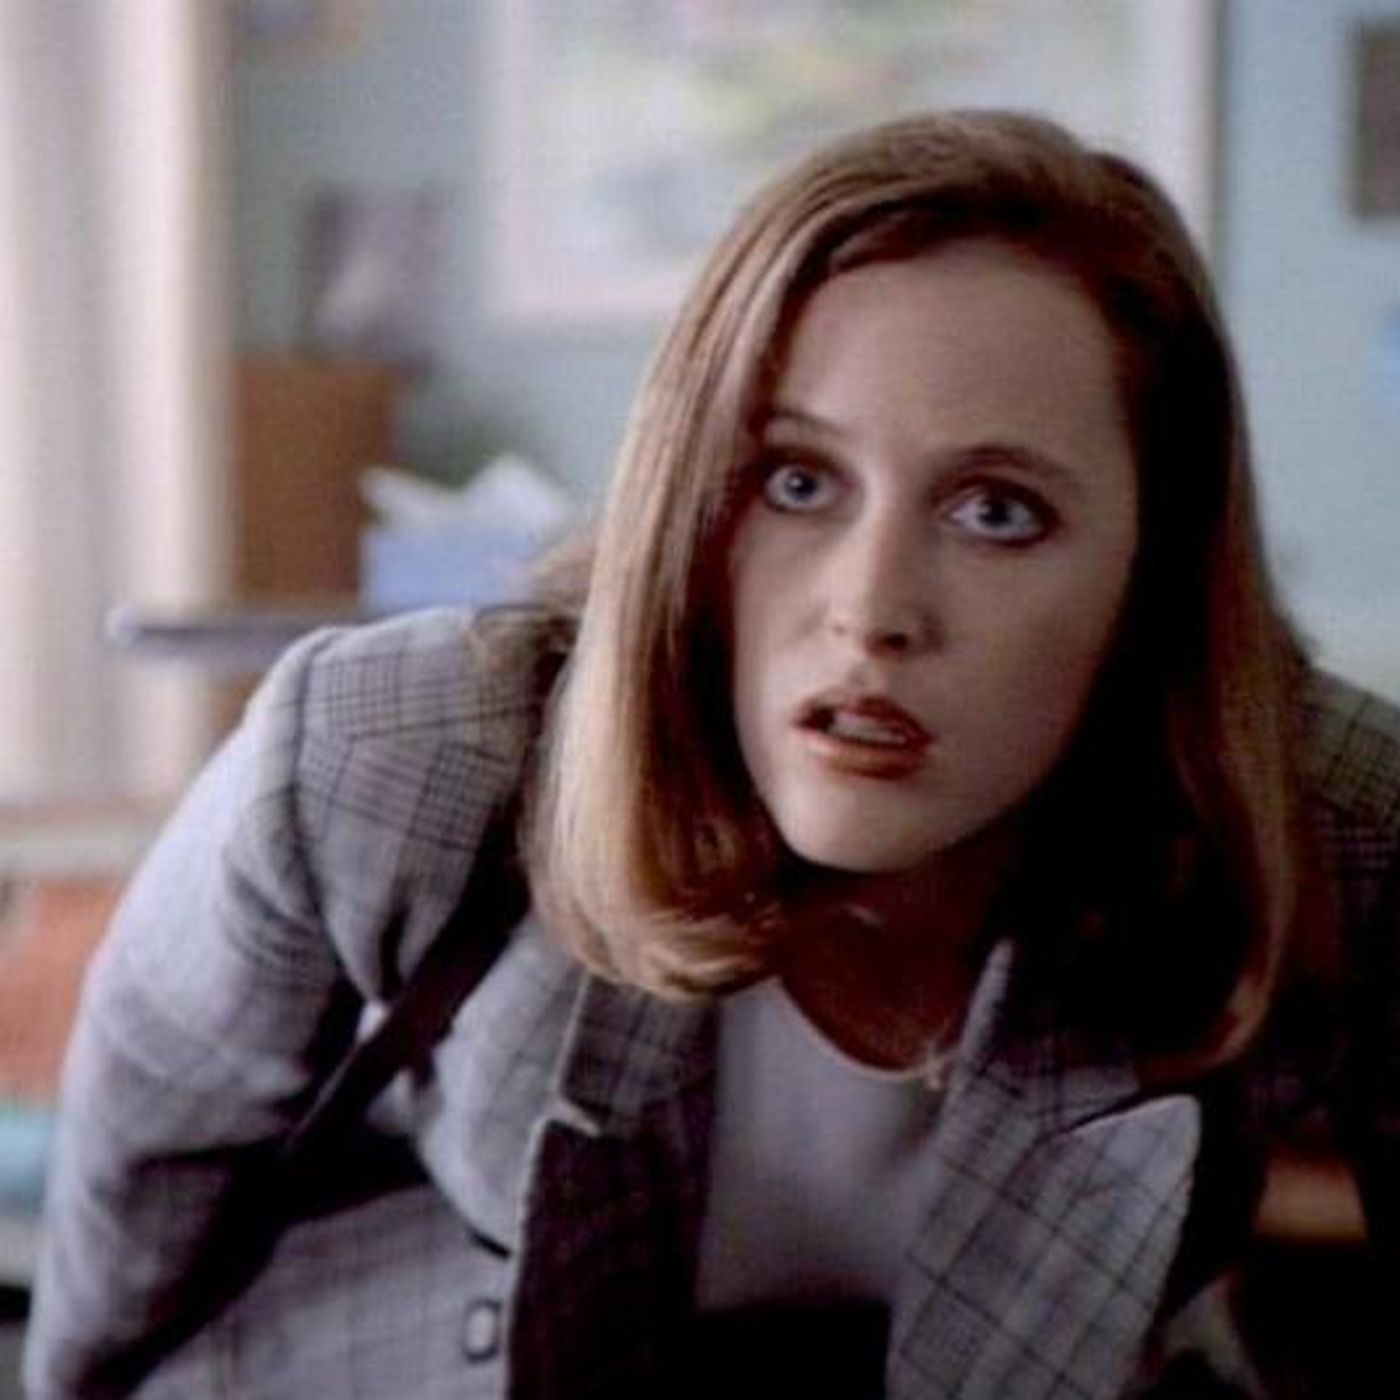 276. Dana Scully in Season One